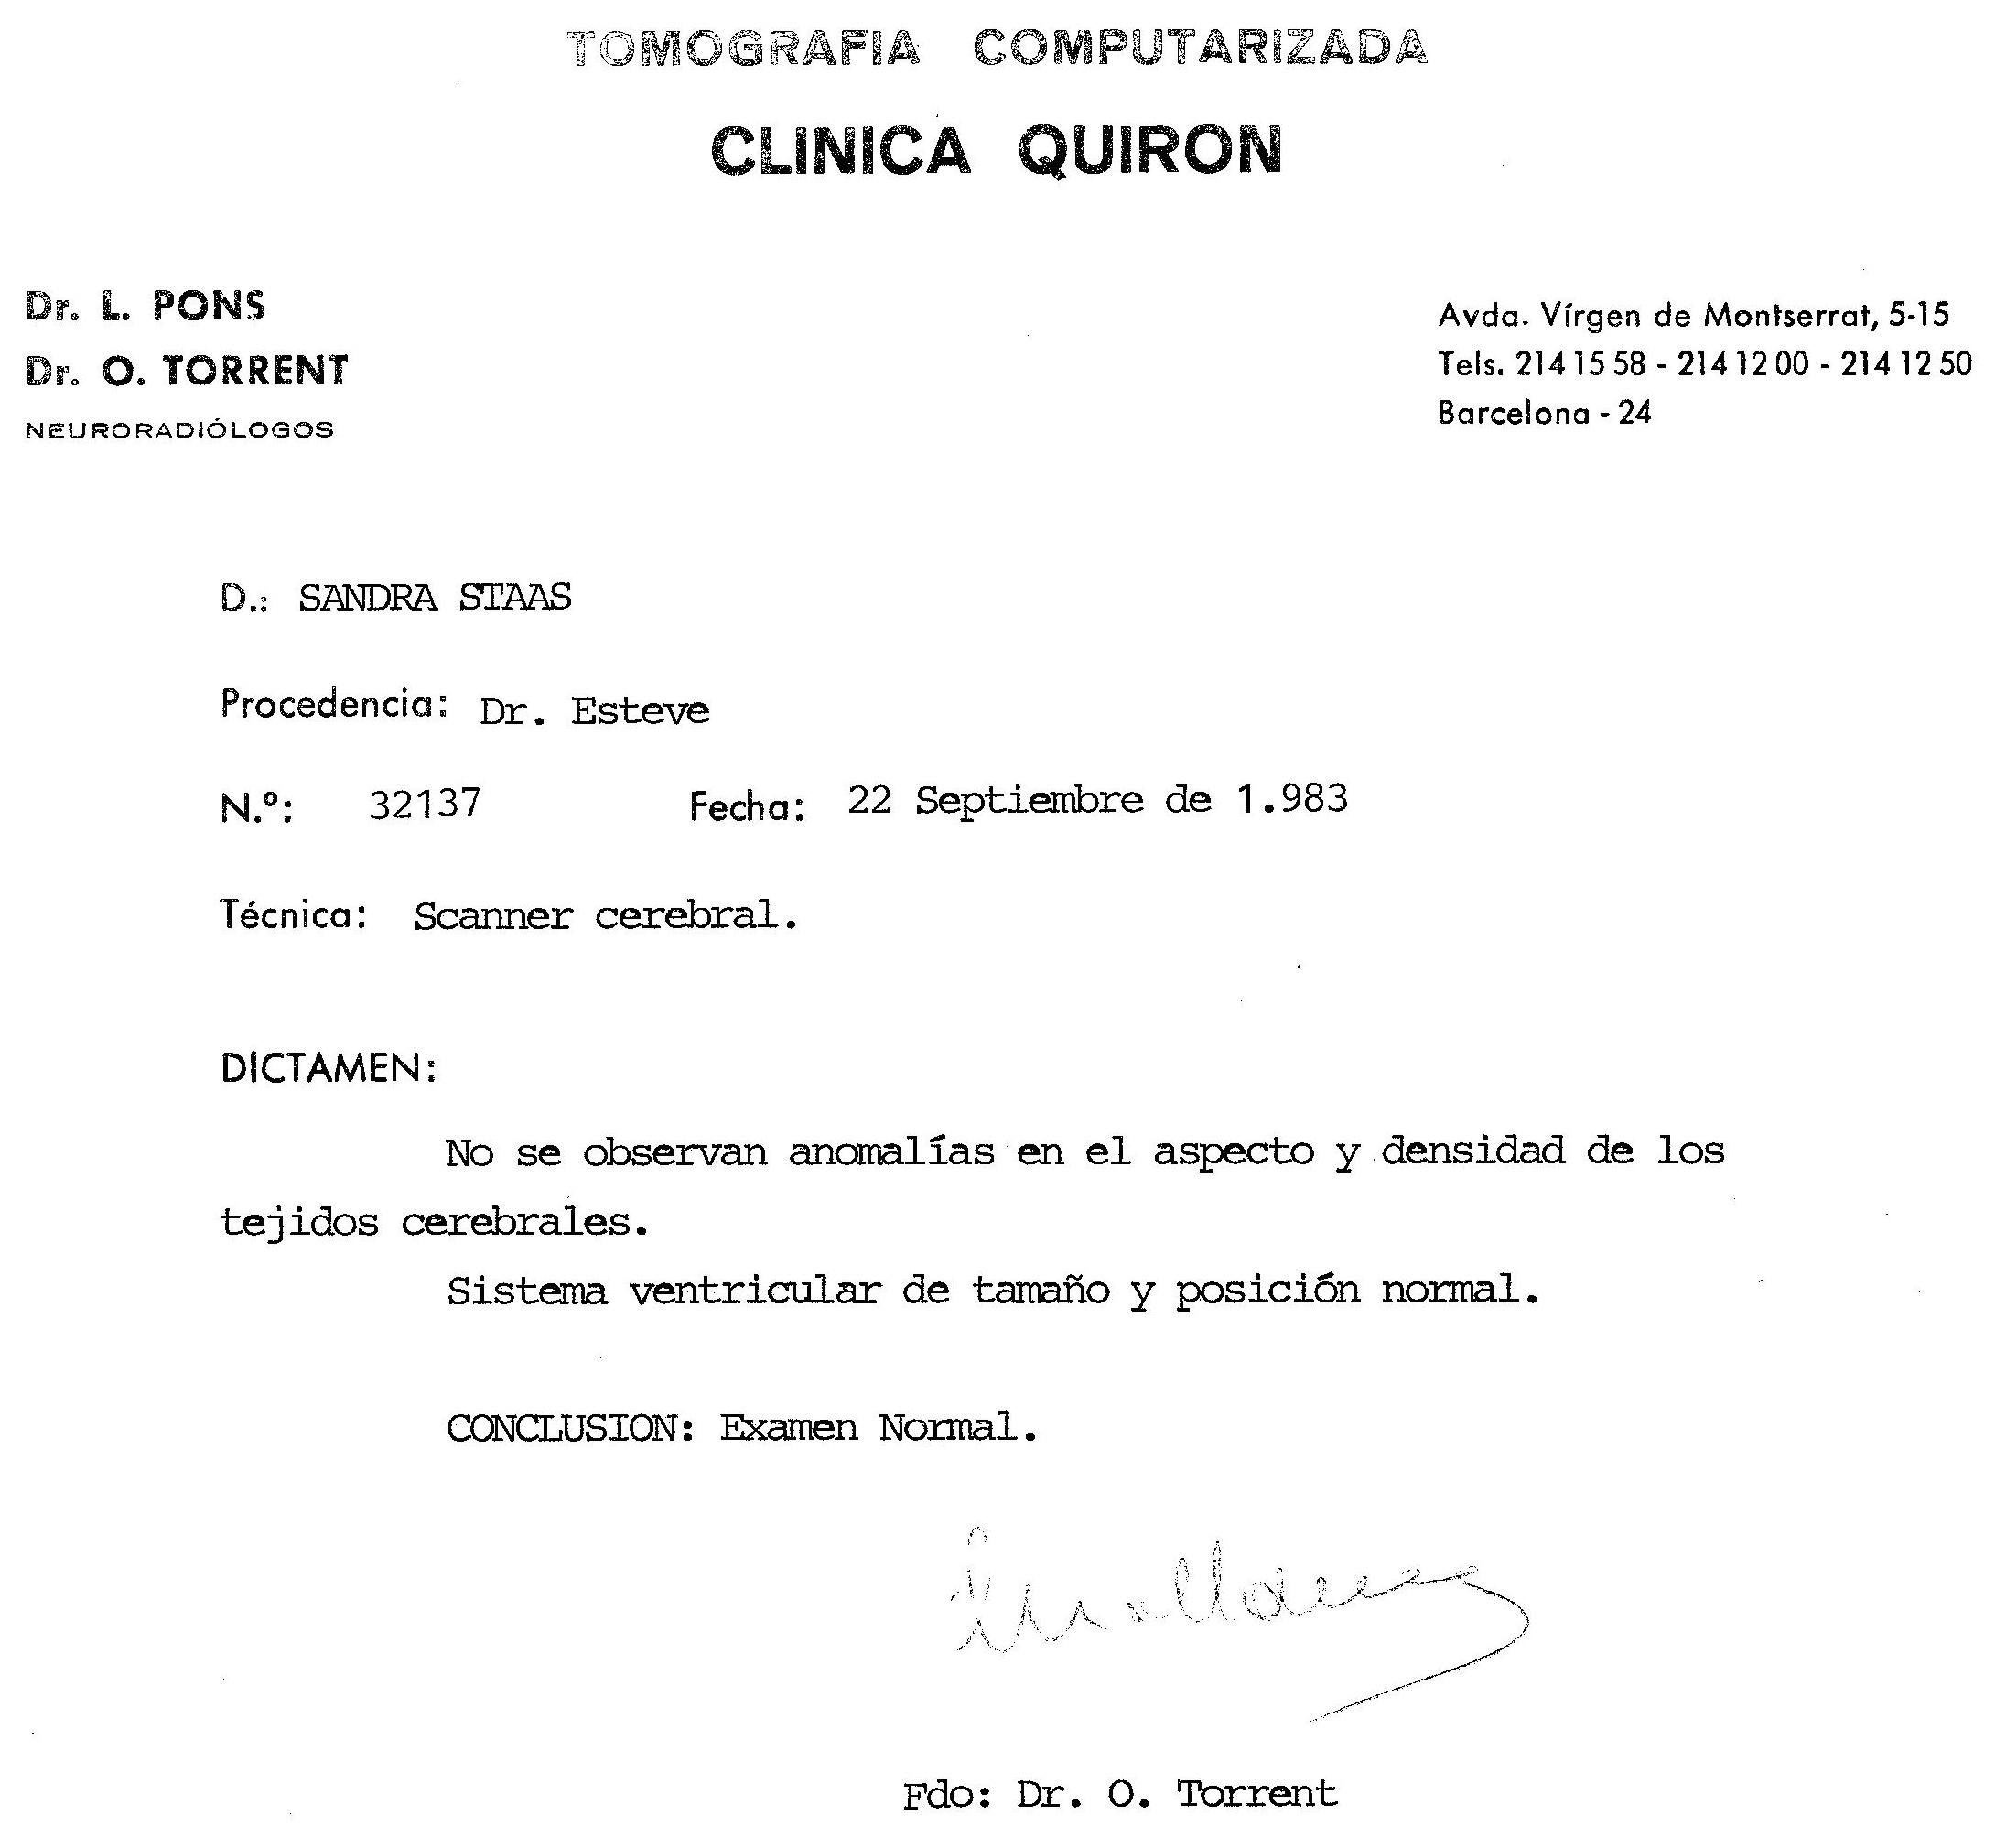 The Brain Scan, Tarragona, Spain, 1983